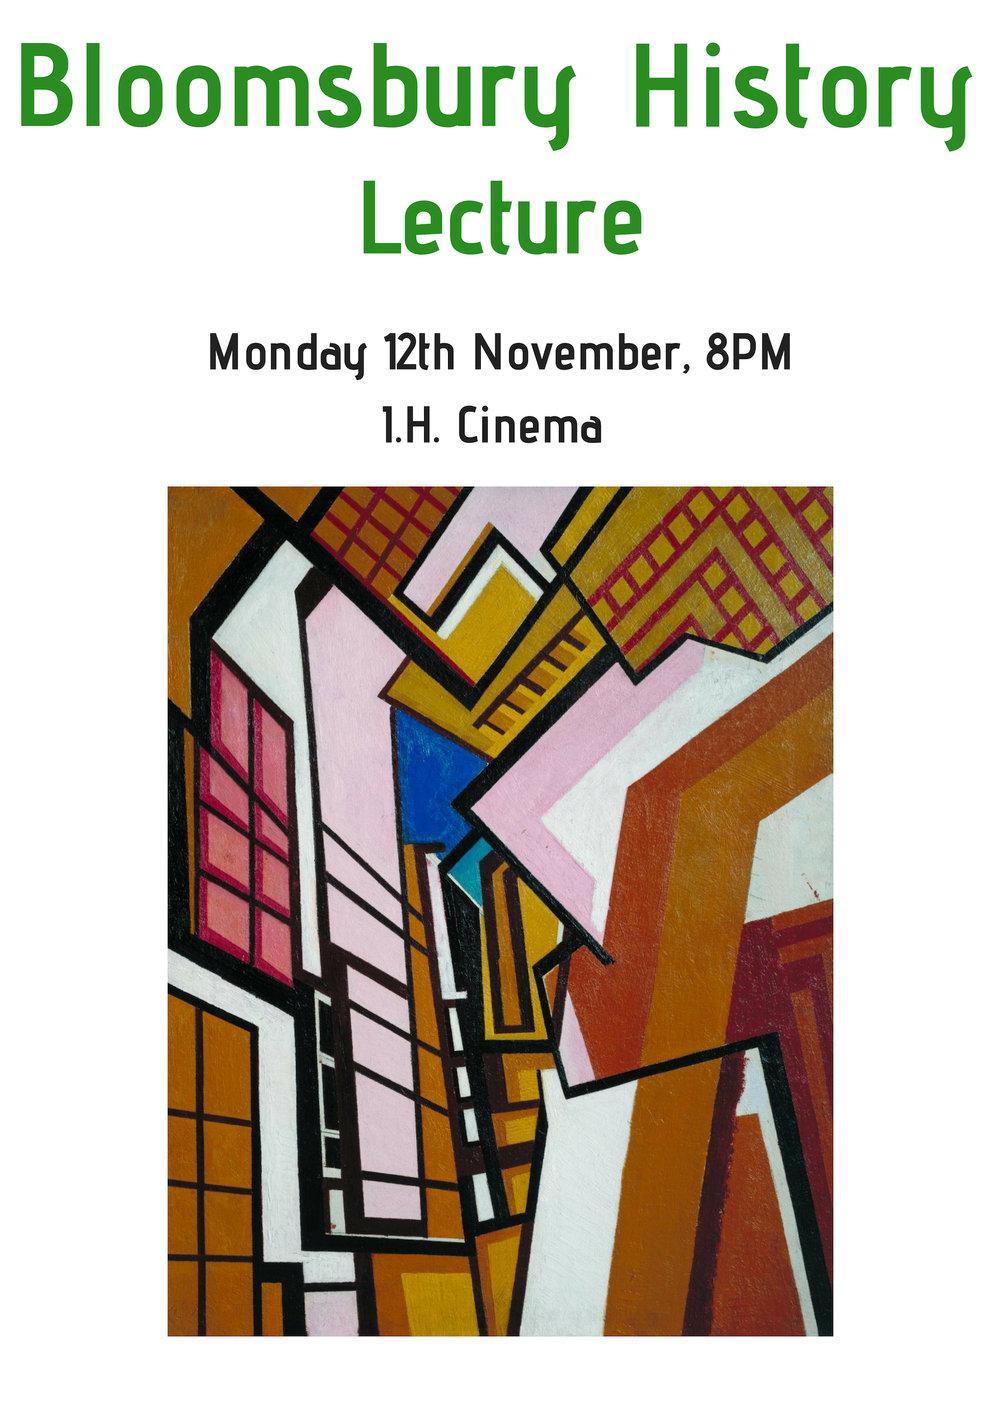 Bloomsbury History Lecture.jpg